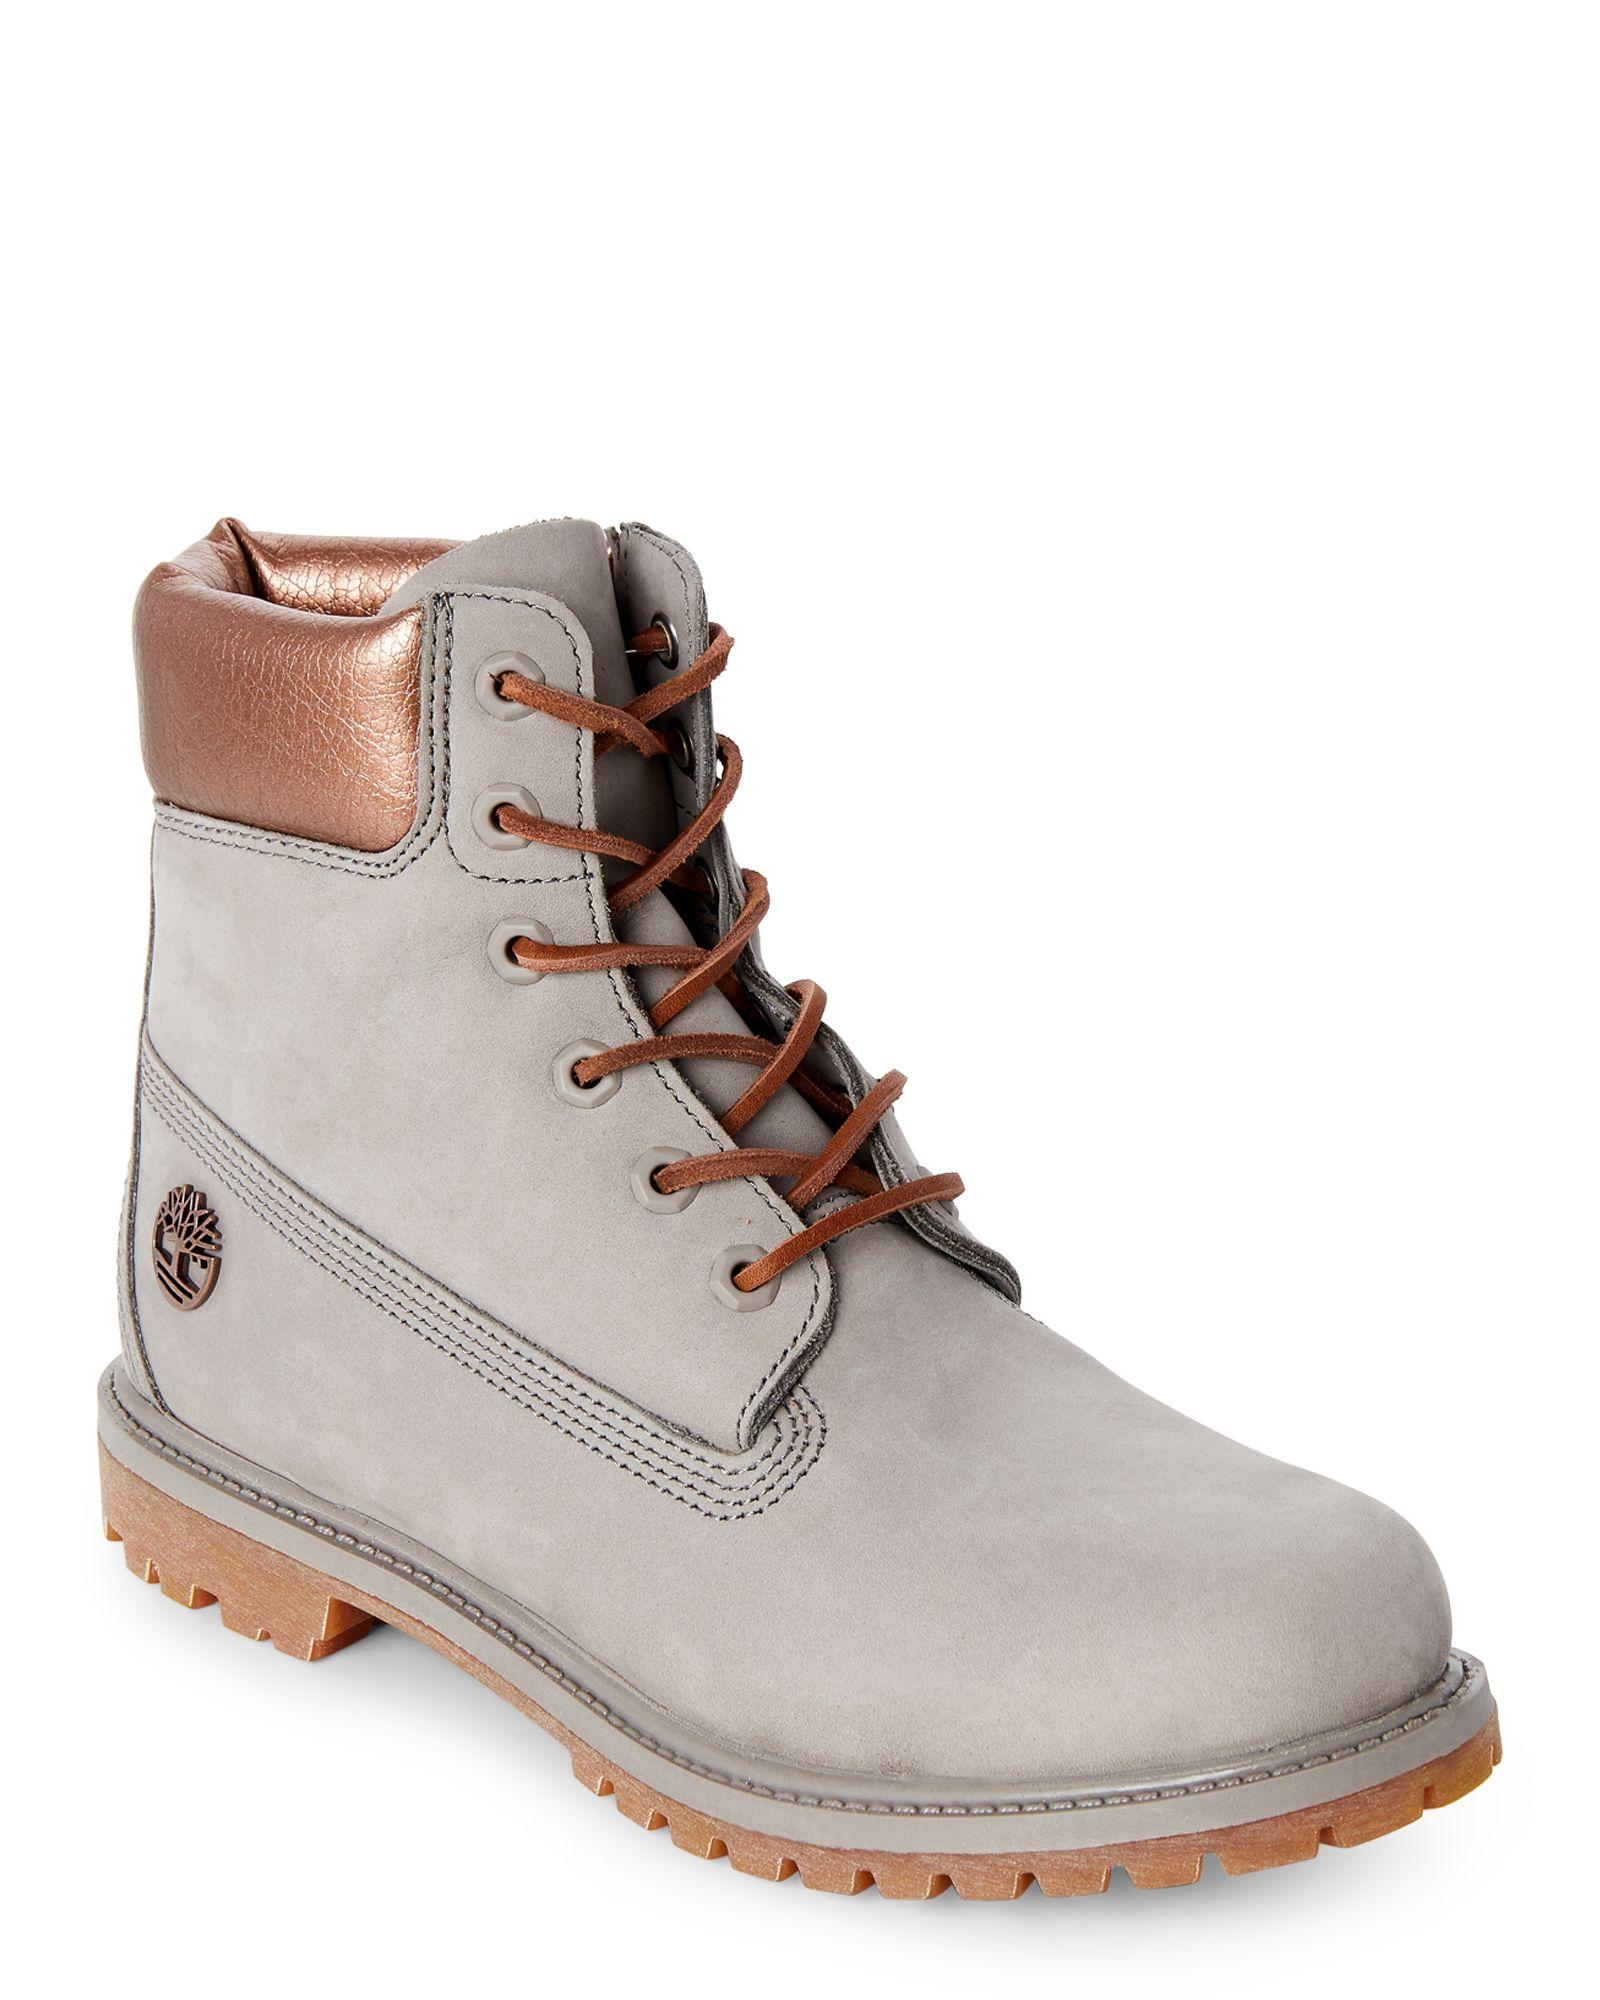 Bronze Steeple Greyamp; Premium 6 Waterproof Bootsapparel 54RjLqc3AS